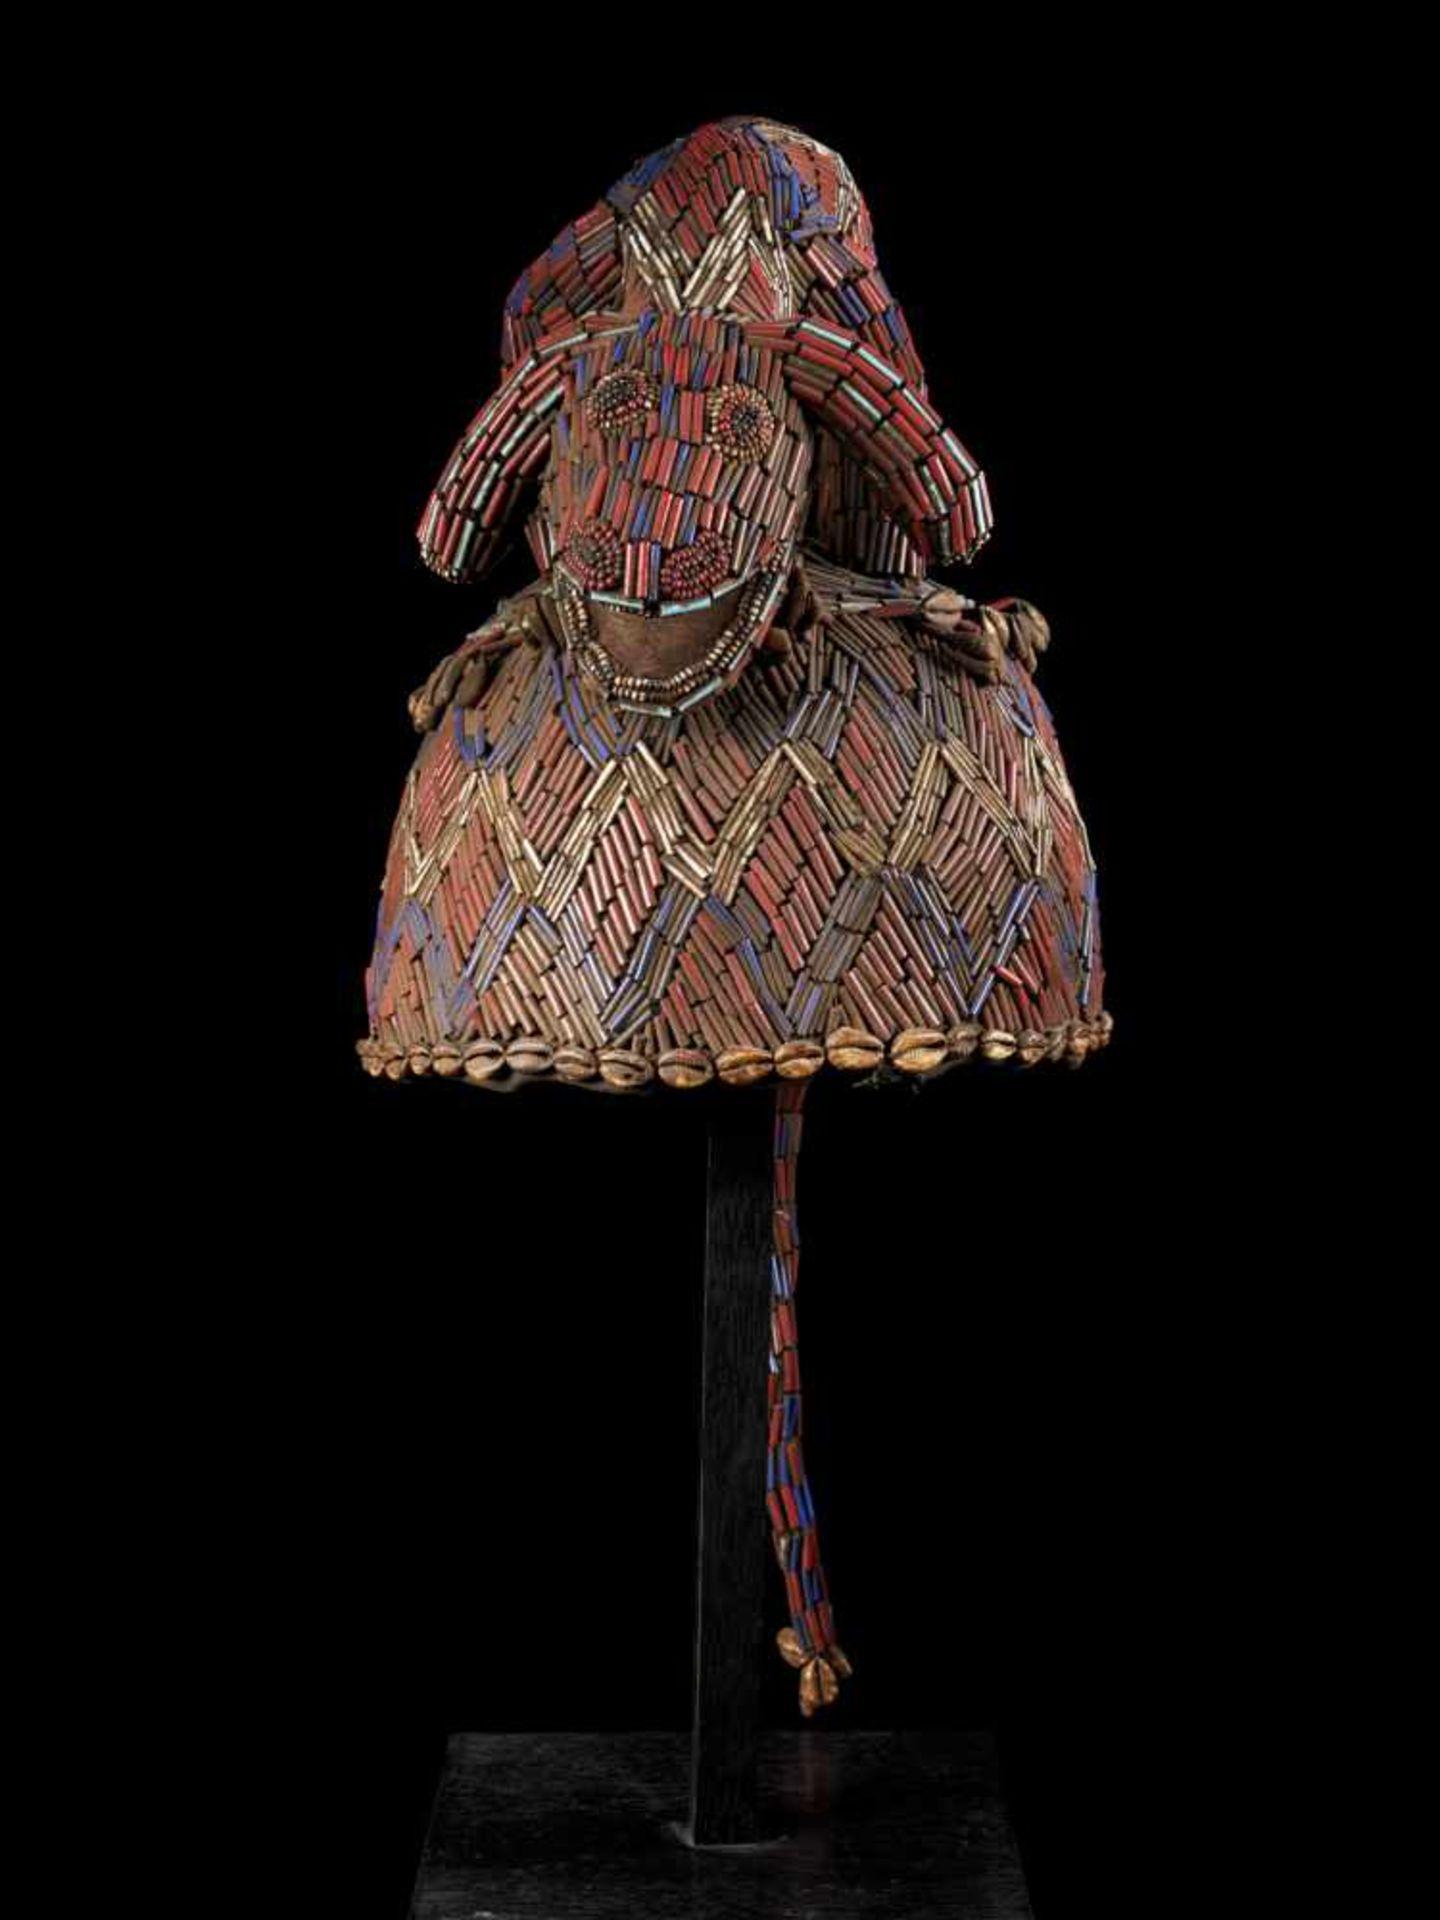 Beaded Blue Headdress With Kauris Finish - Tribal ArtThis impressive headdress is delightfully - Bild 2 aus 5